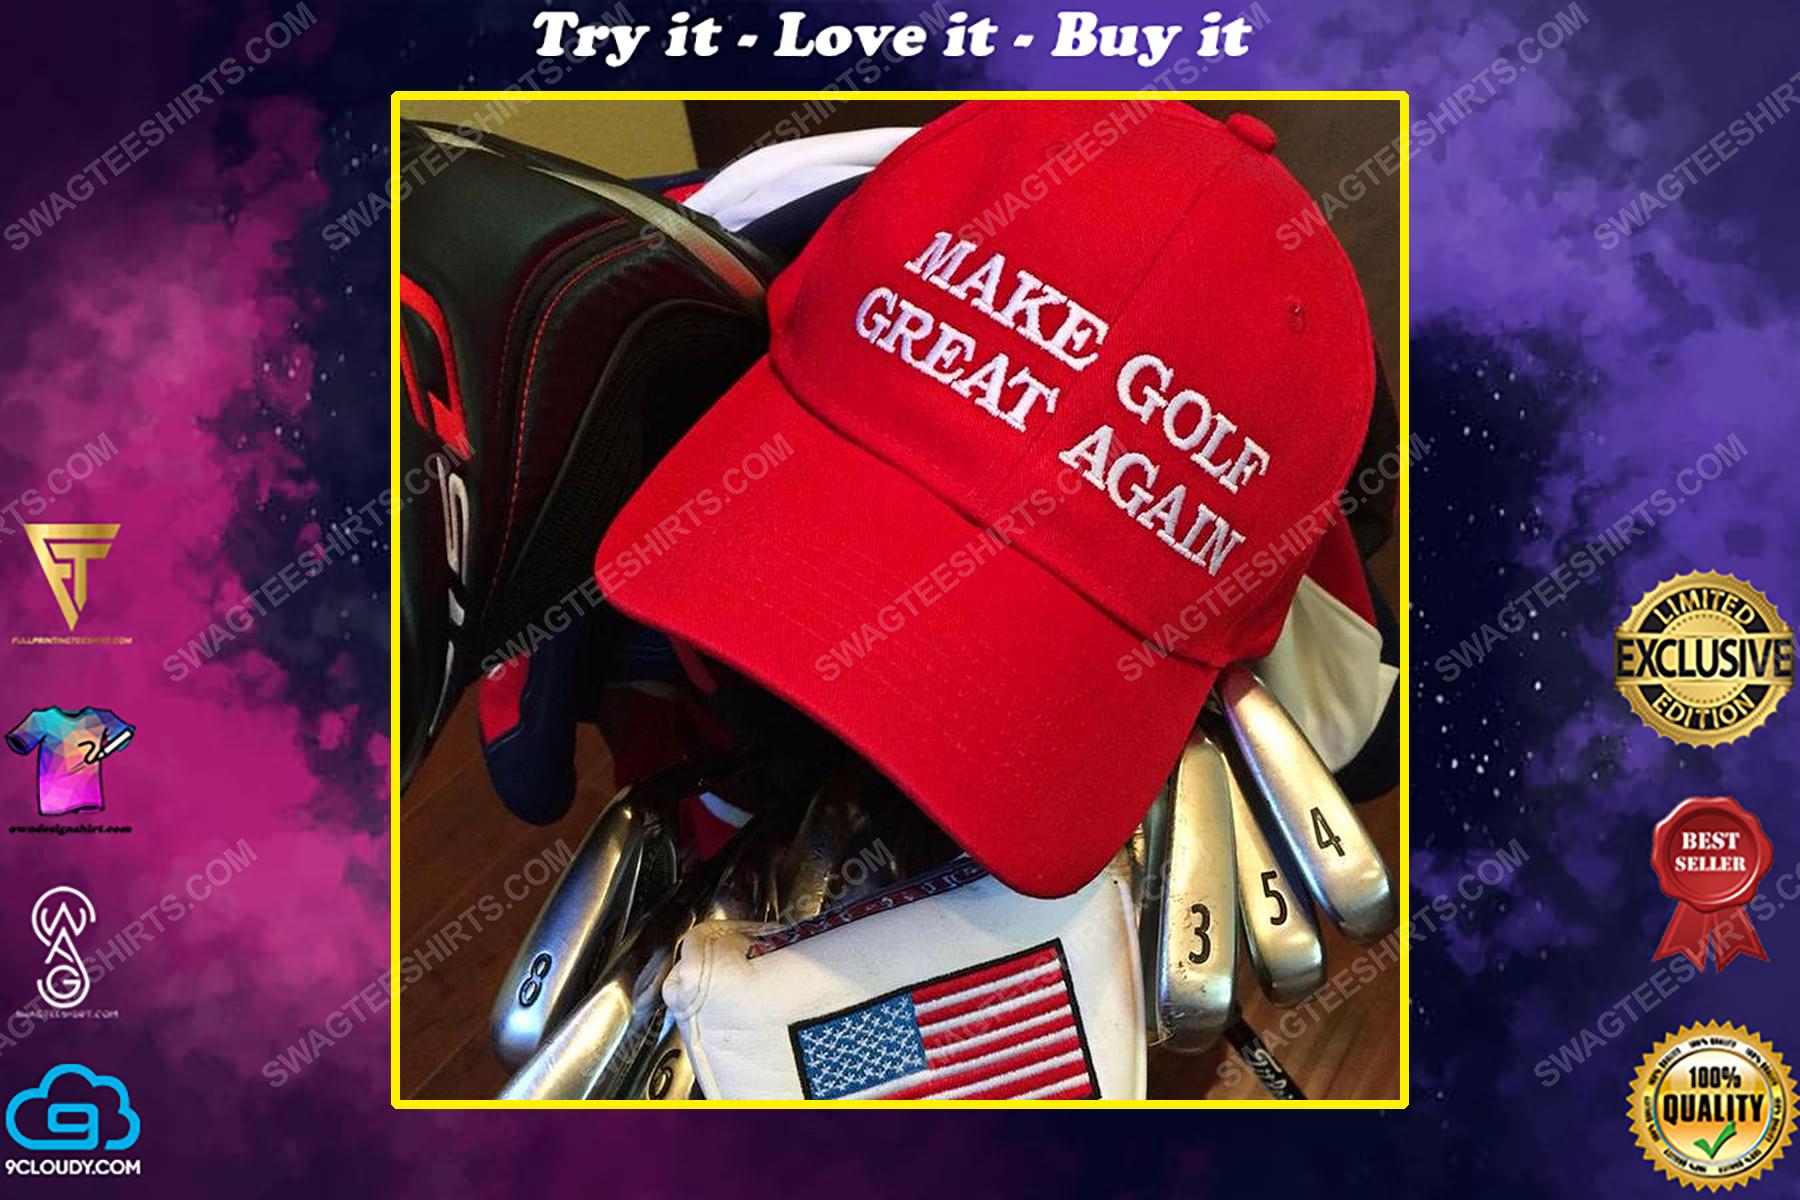 Make golf great again full print classic hat